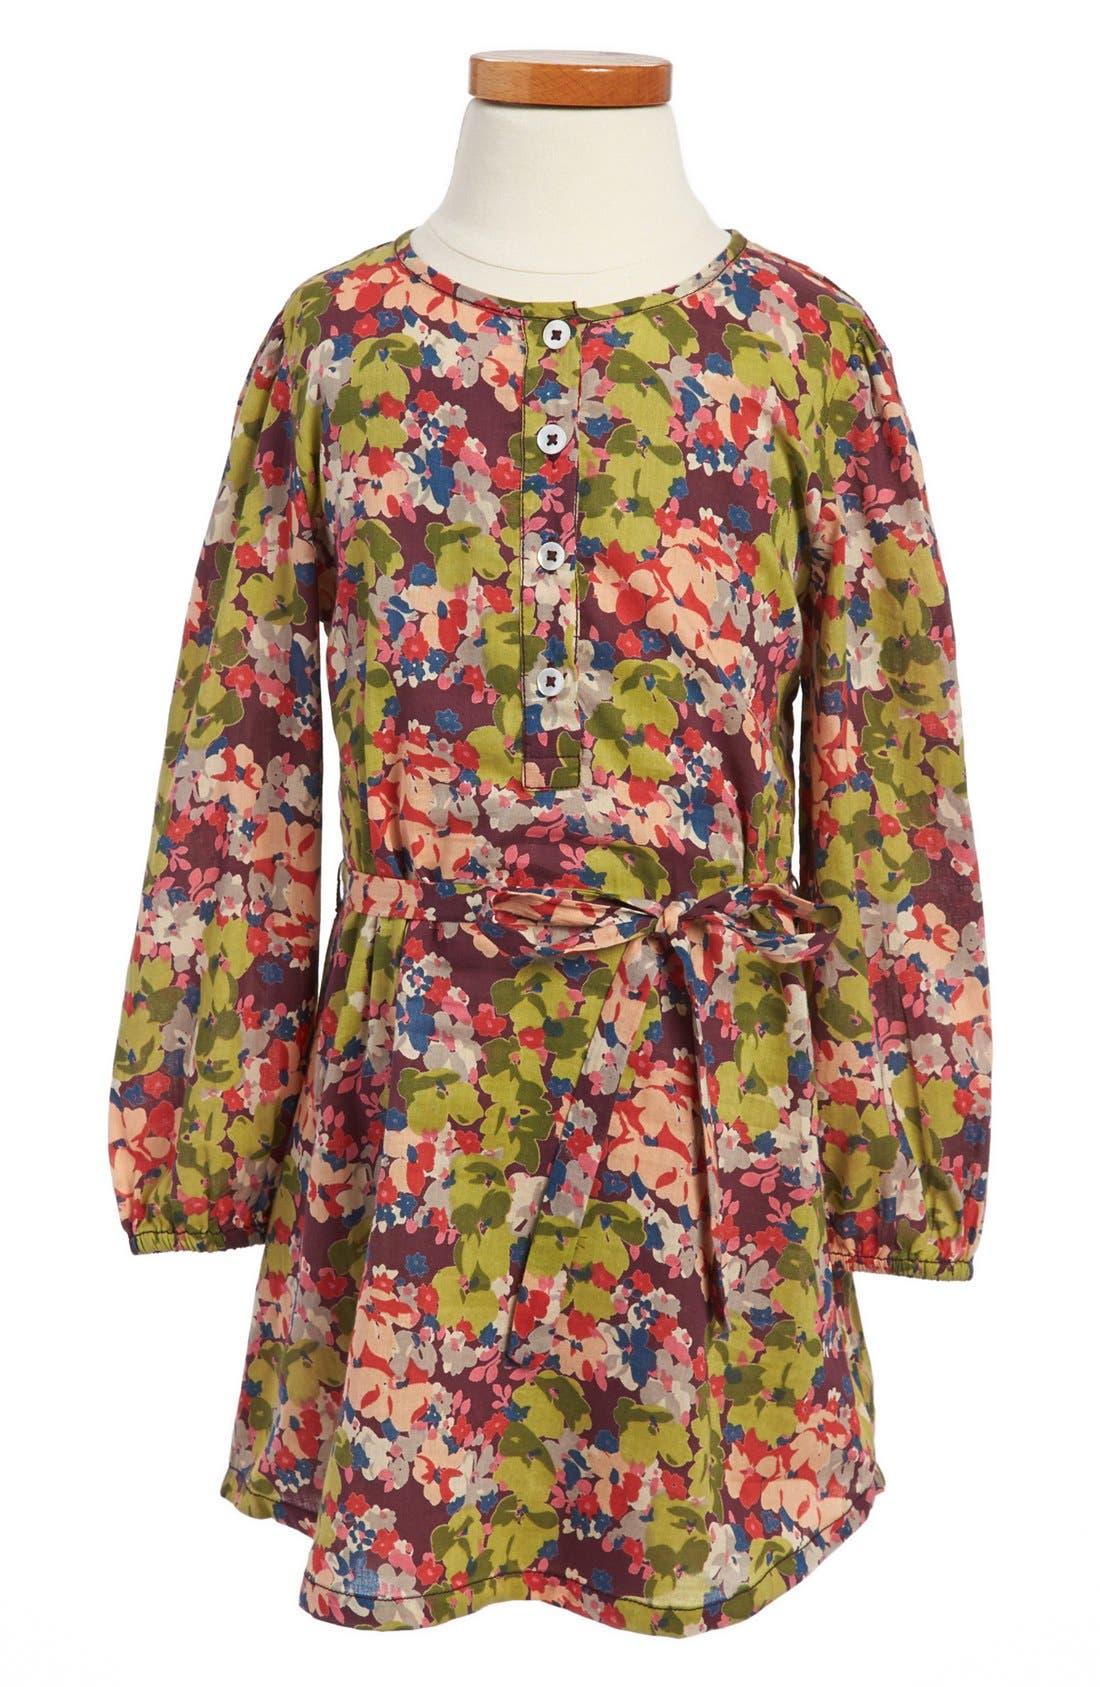 Main Image - Peek 'Miller' Dress (Toddler Girls, Little Girls & Big Girls)